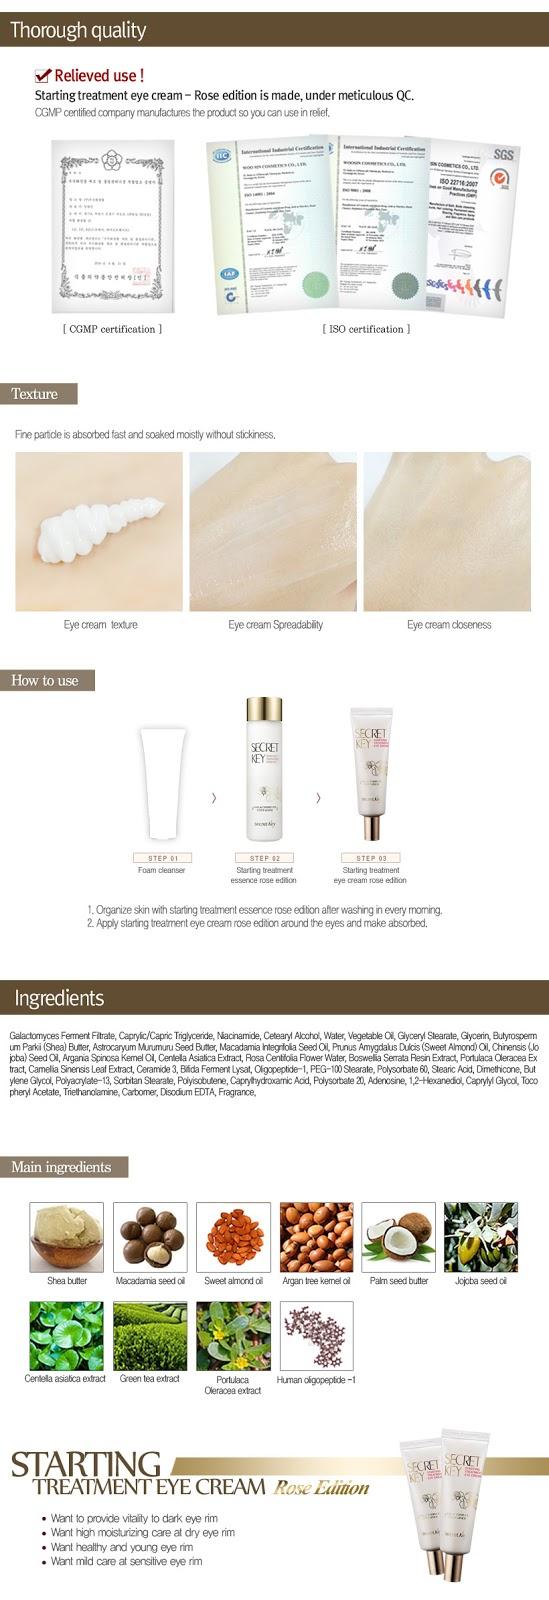 Pinky Noona Shop Secret Key Starting Treatment Eye Cream Rose 50gr Cara Pemesanan